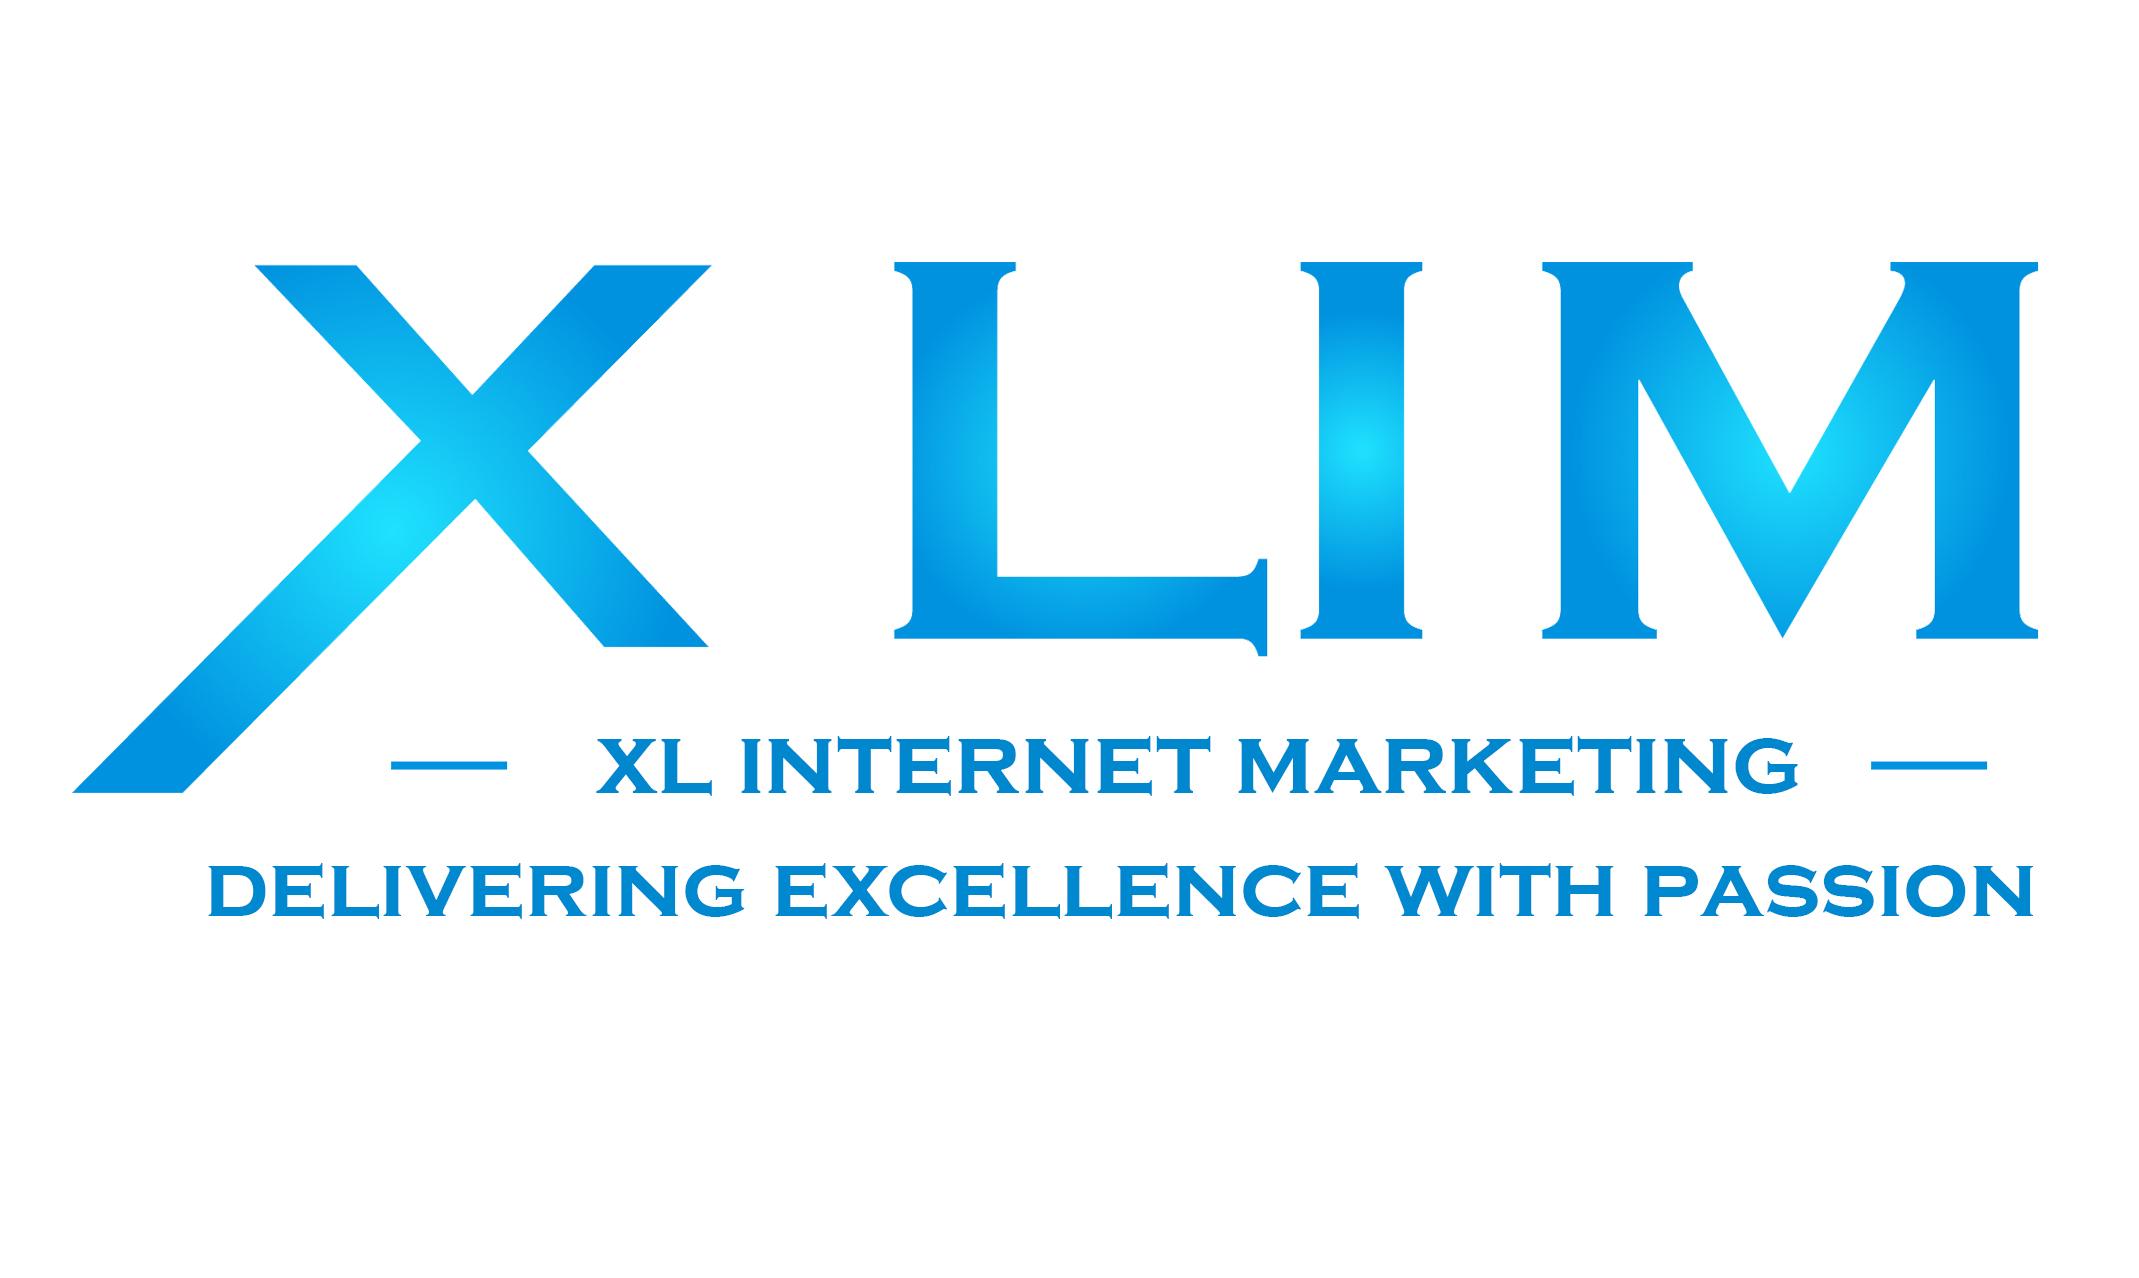 XL Internet Marketing Job Openings